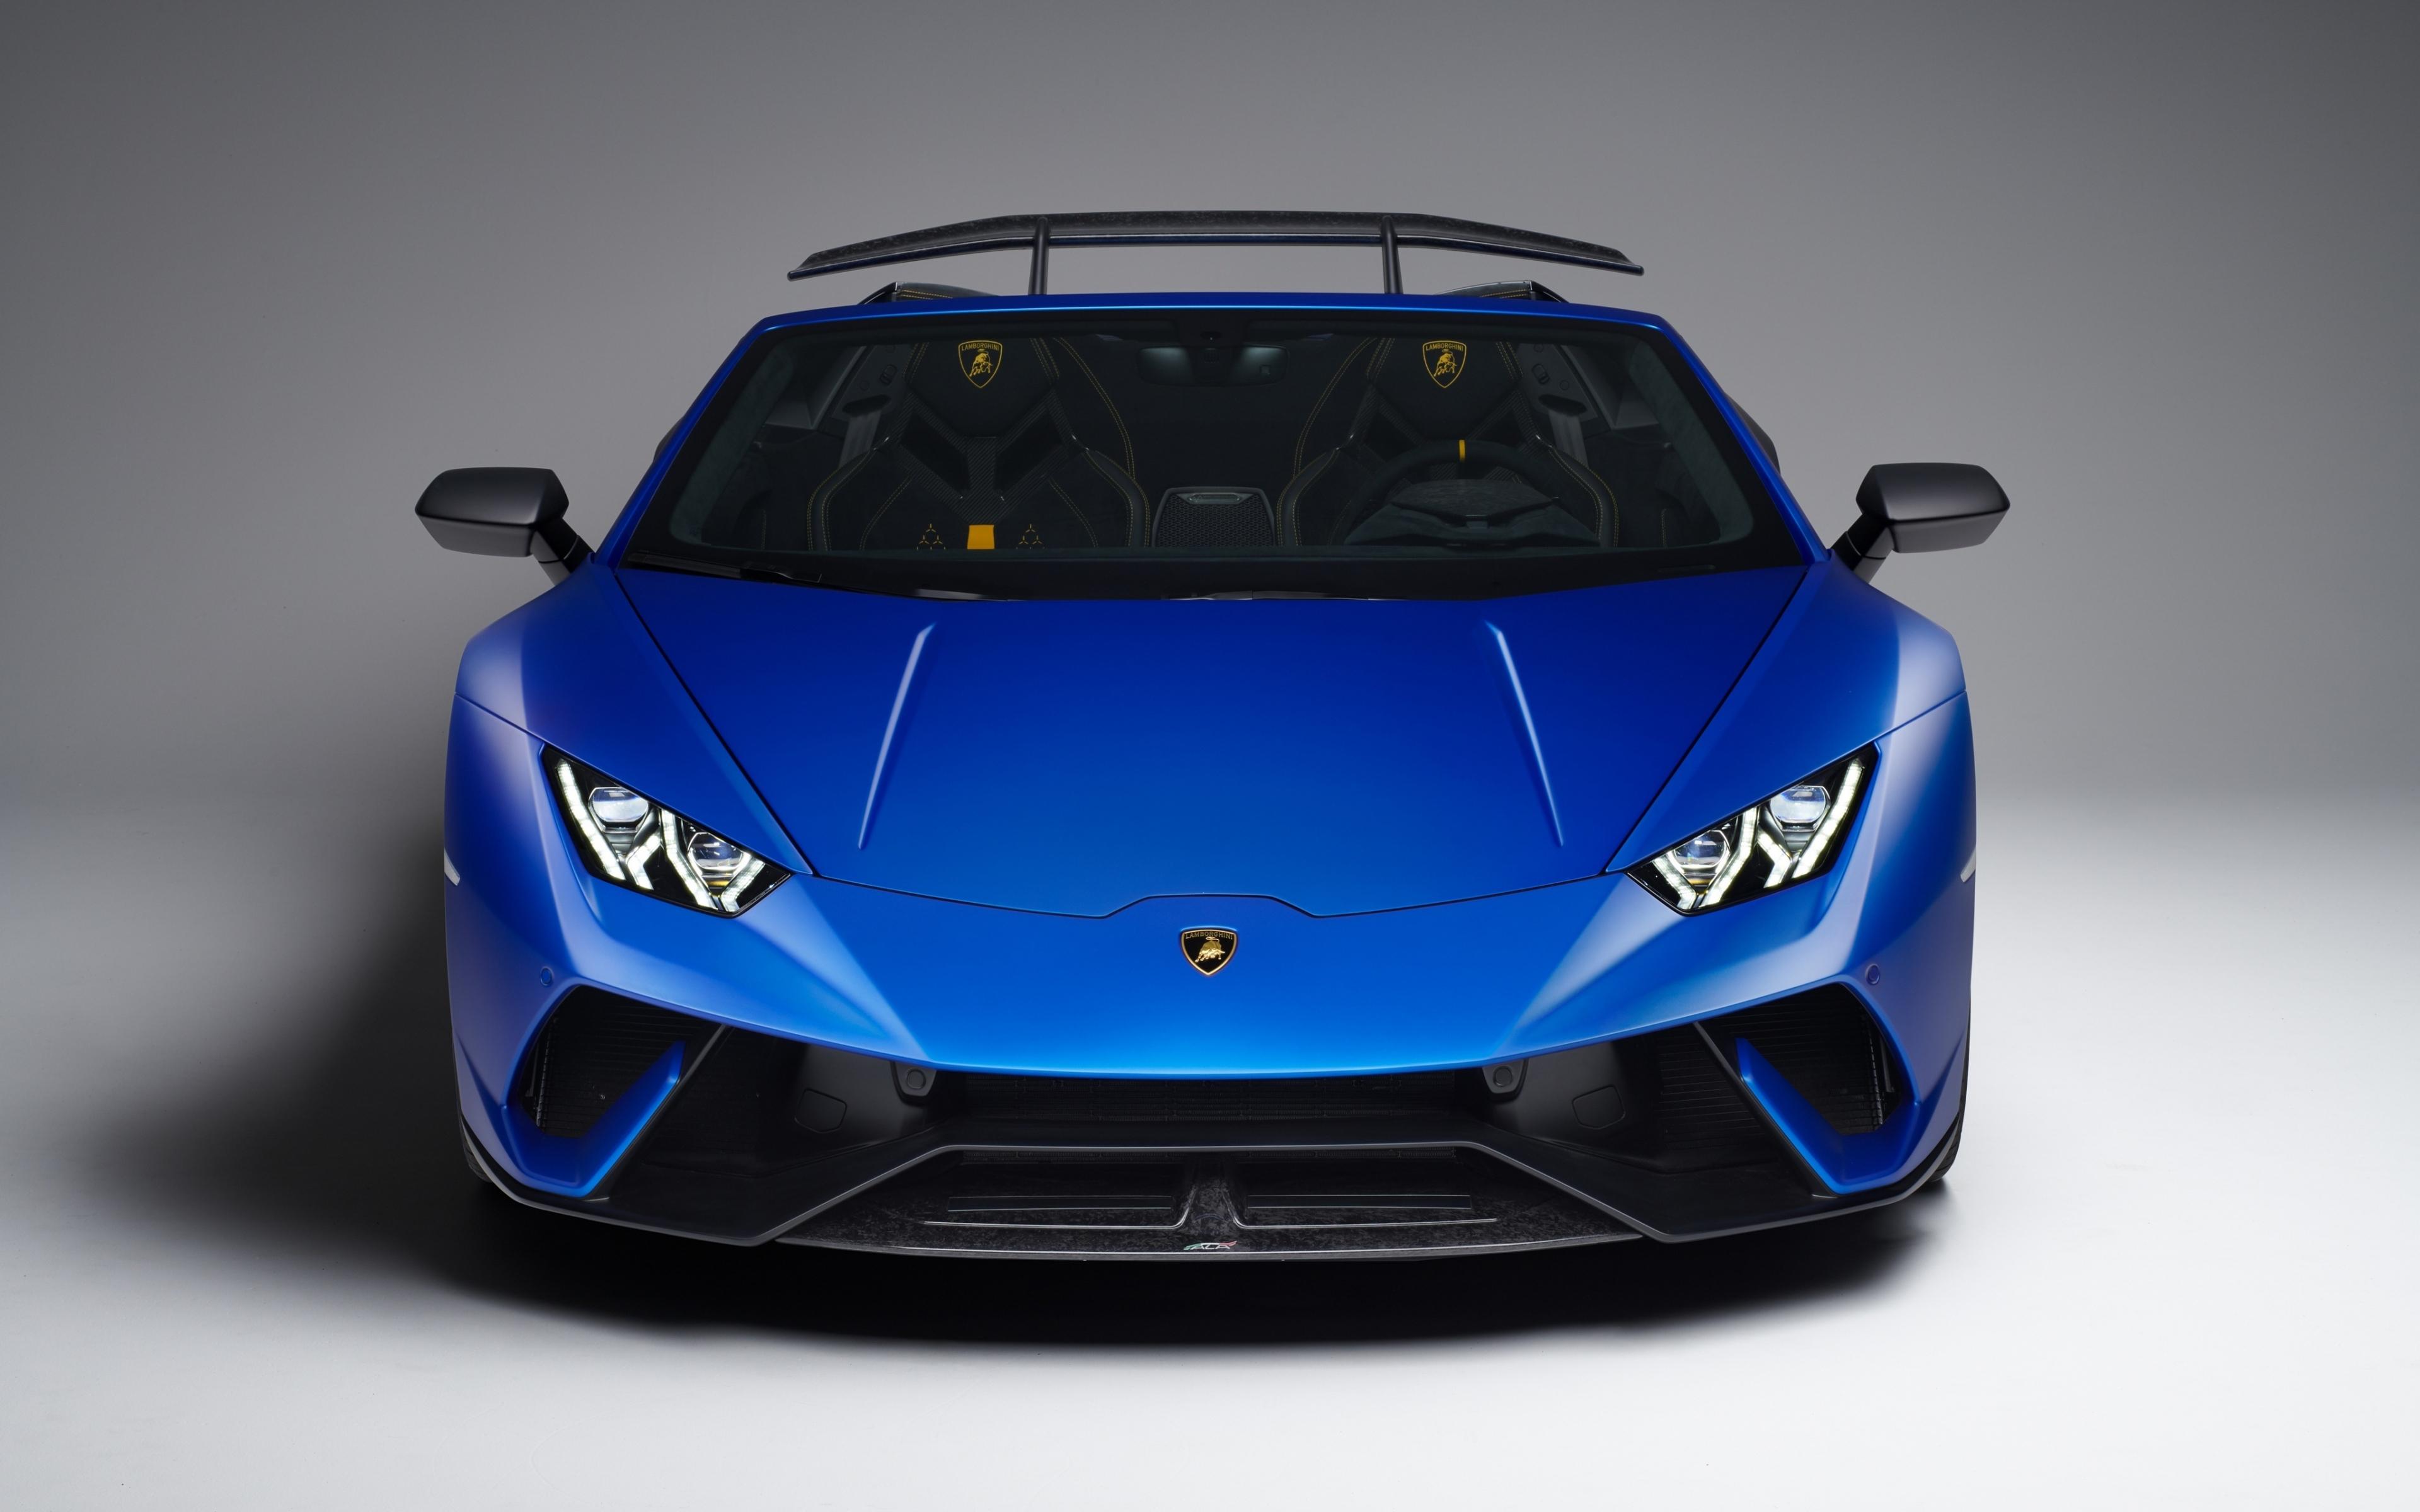 Download 3840x2400 Wallpaper Lamborghini Huracan Performante Spyder